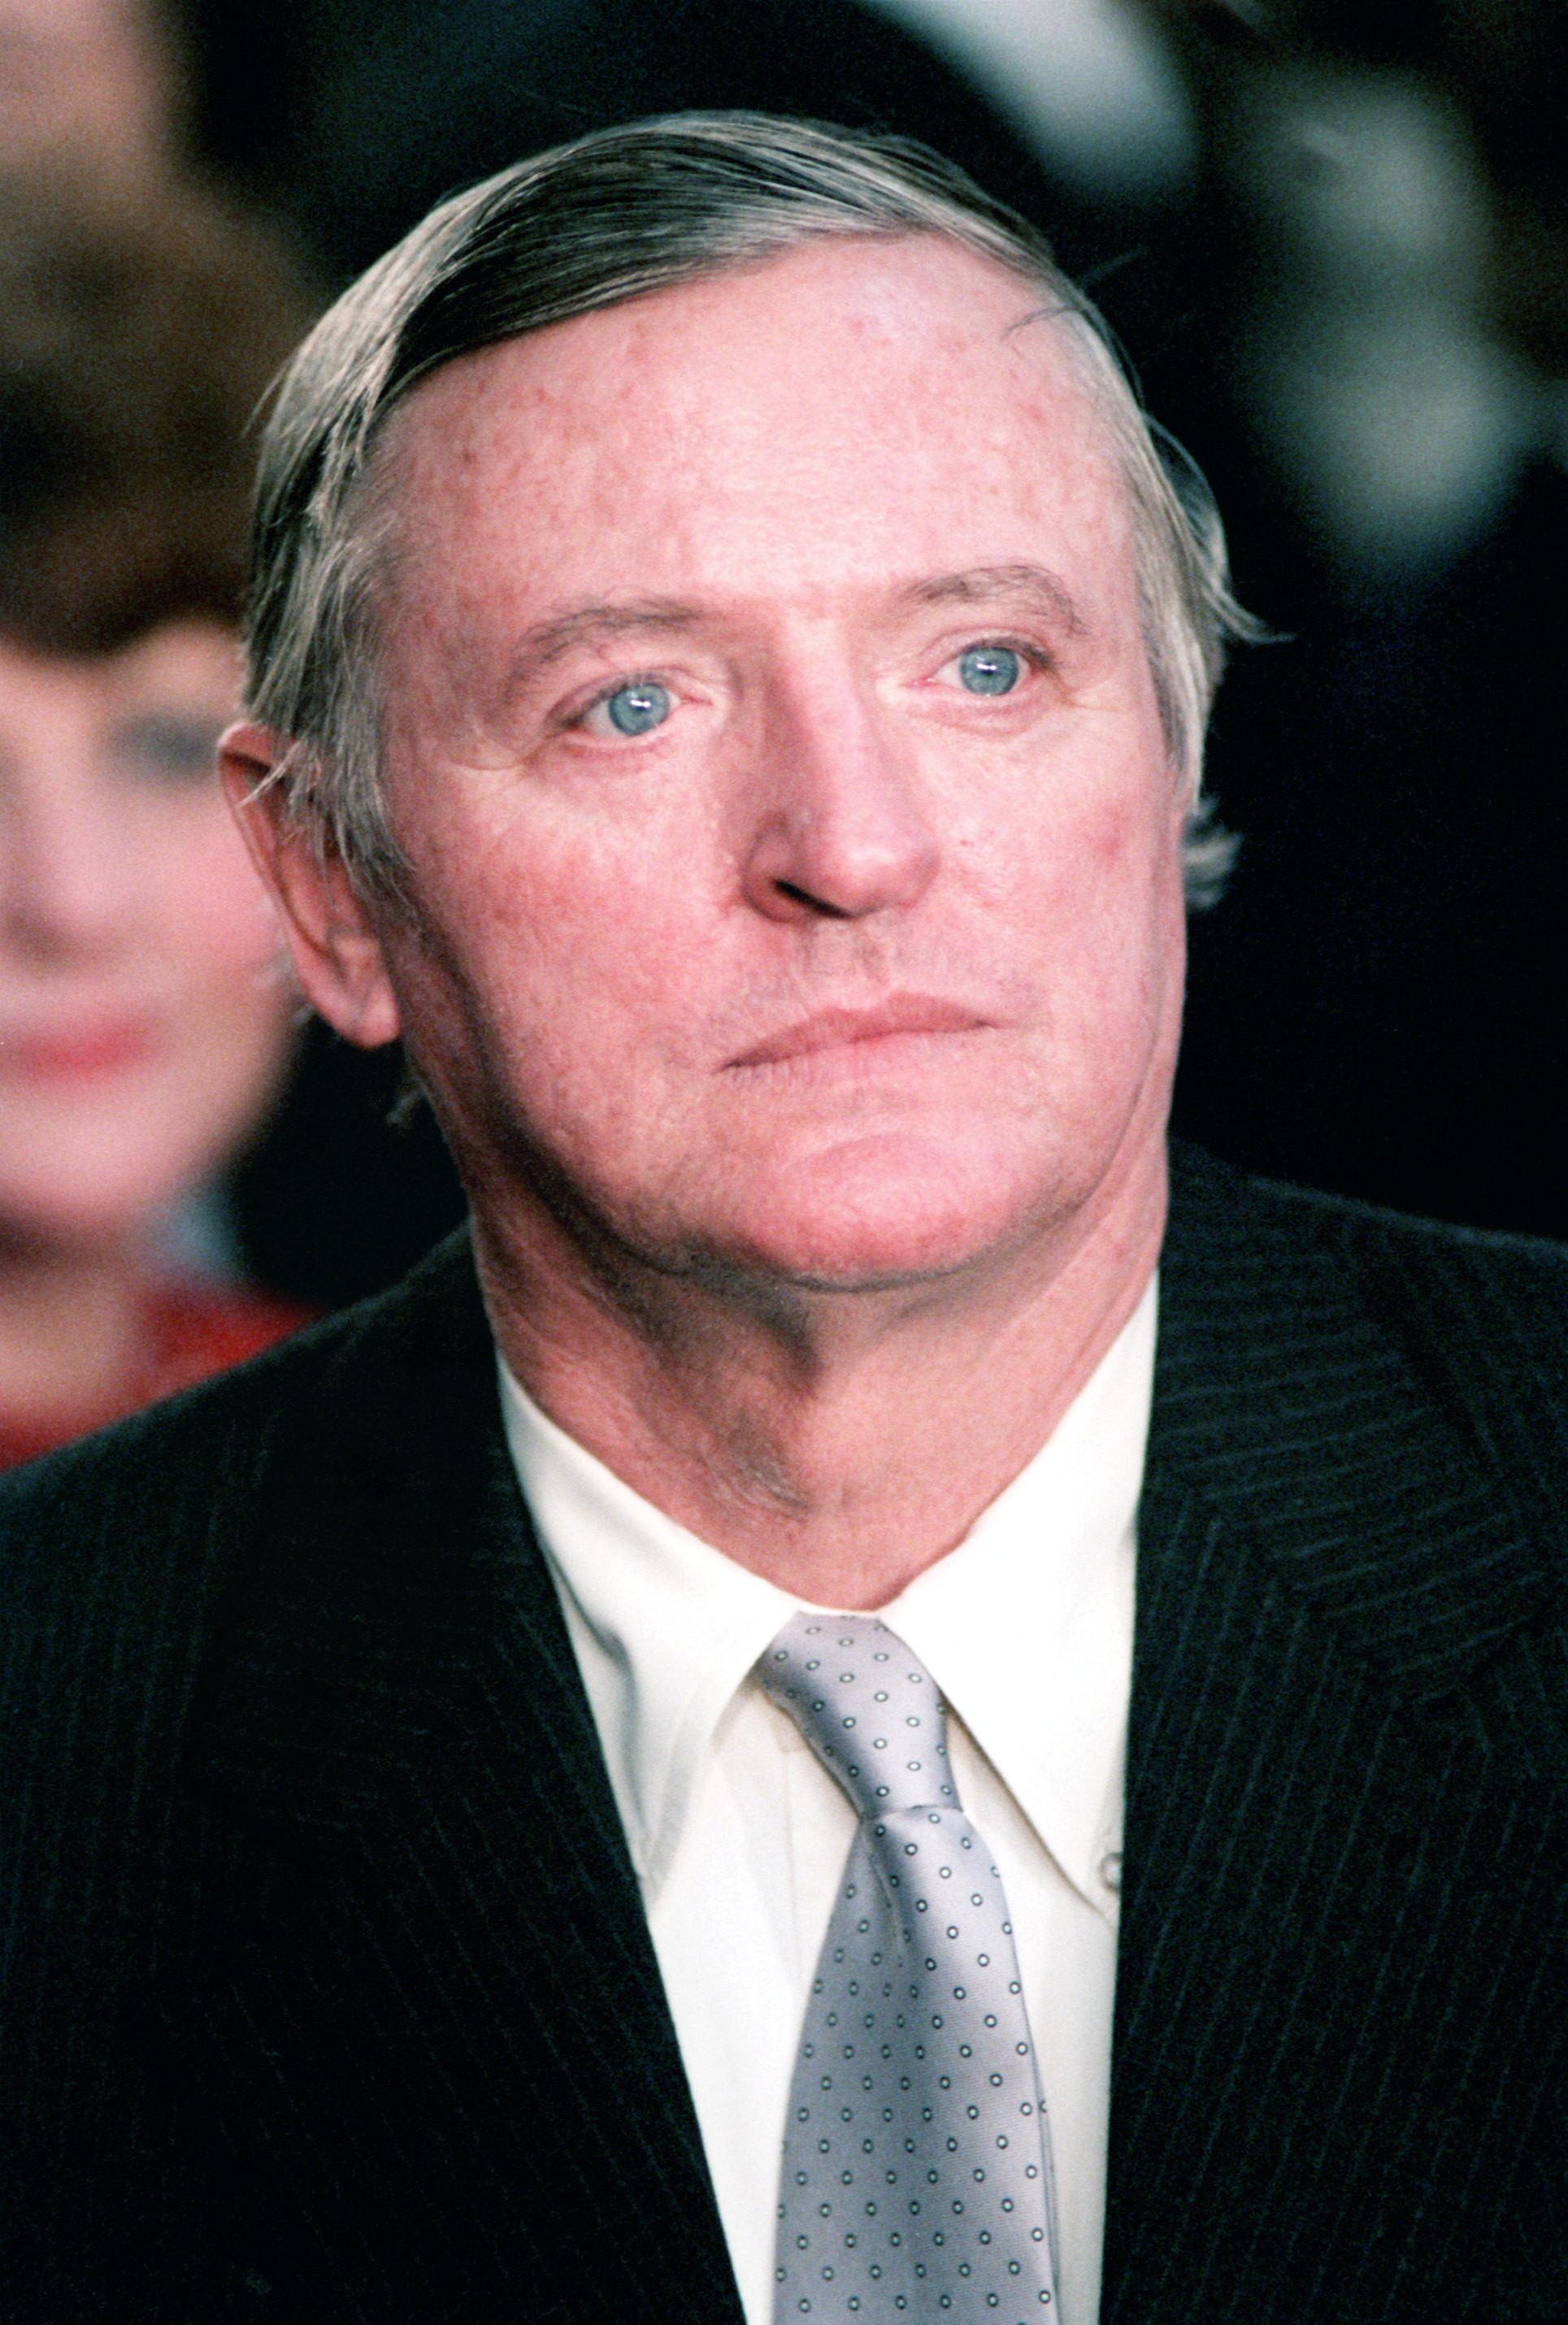 William_F__Buckley,_Jr__1985